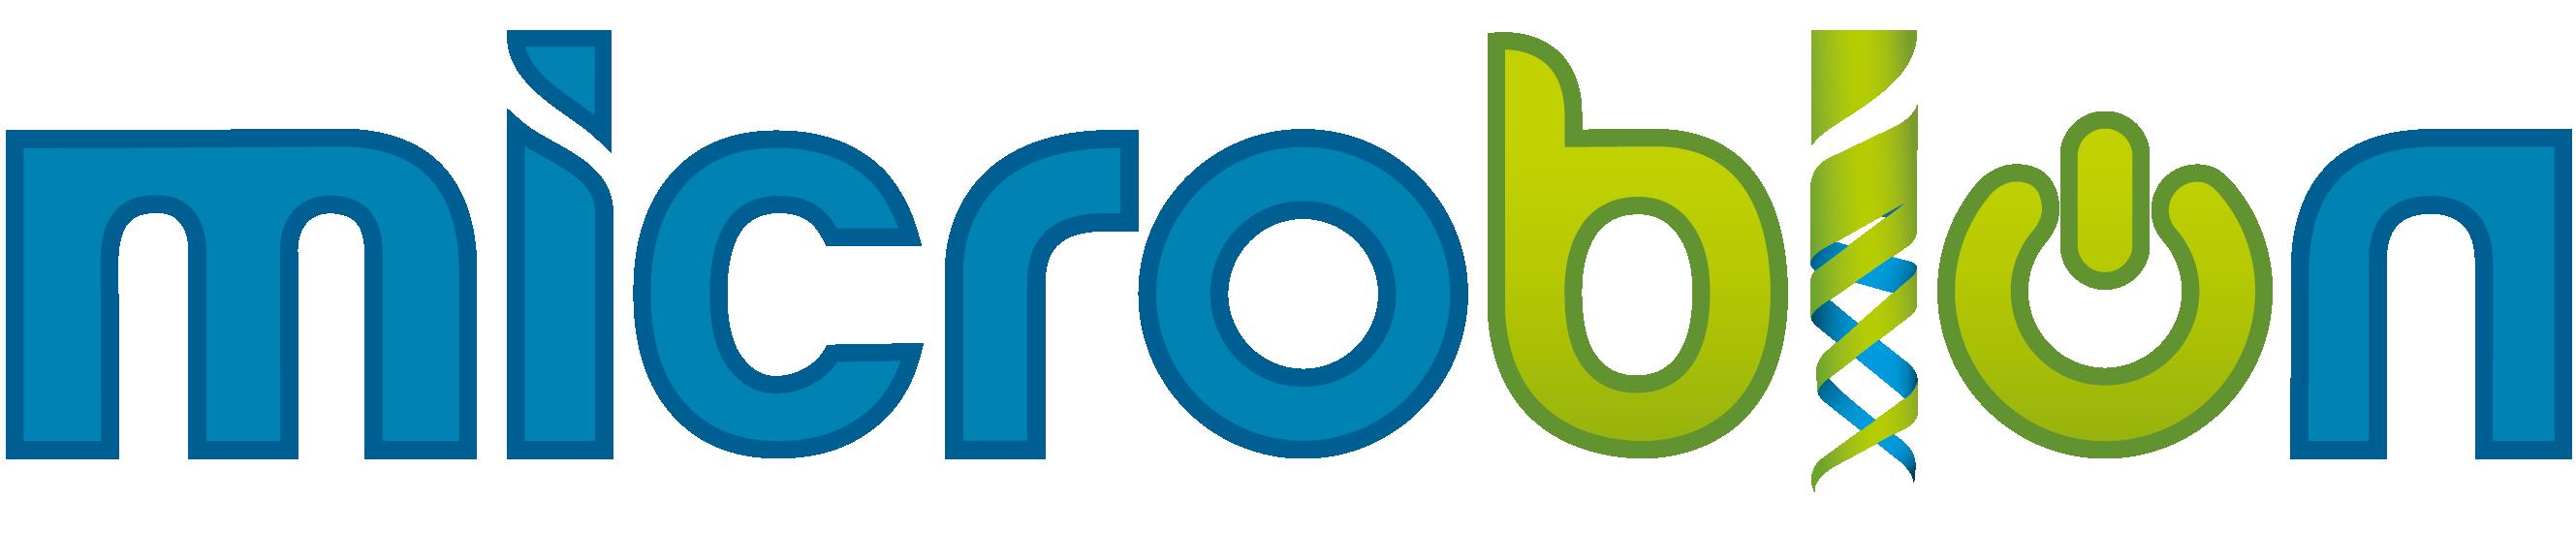 Microbion